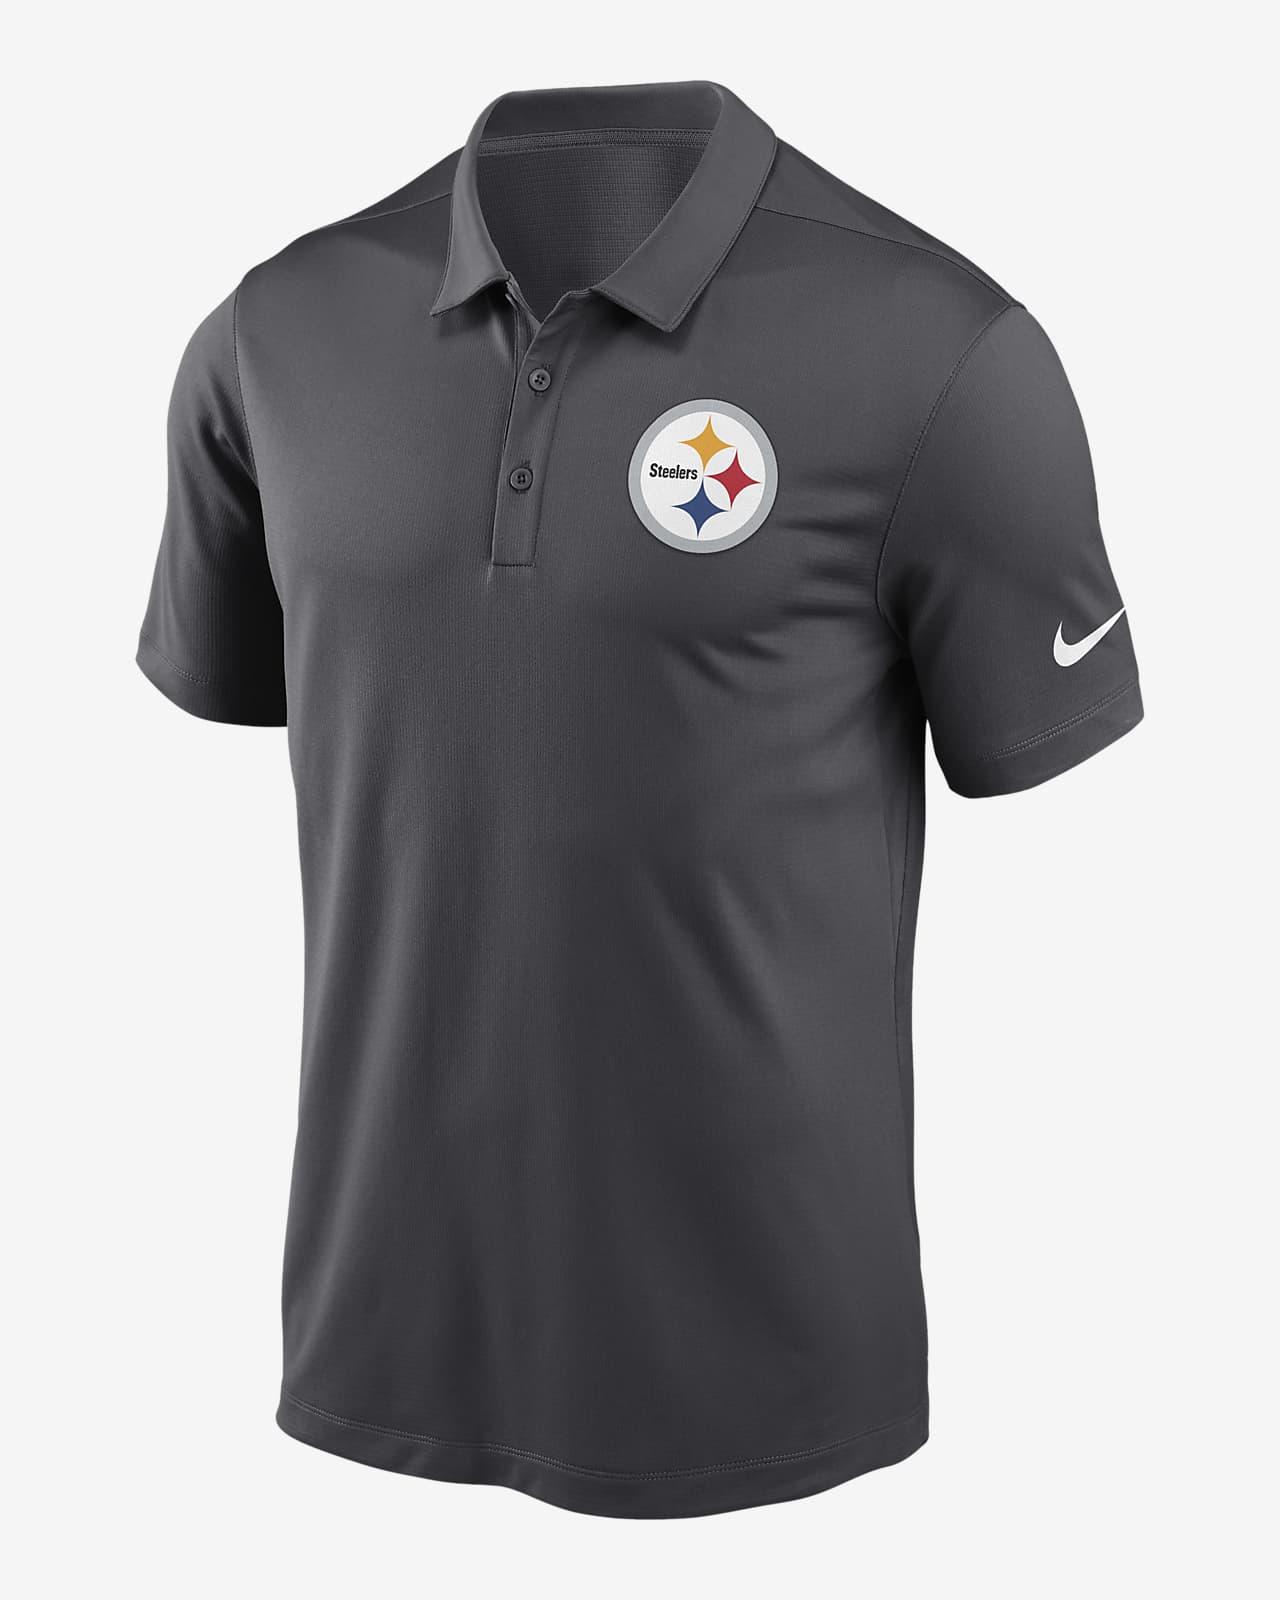 Nike Dri-FIT Logo Franchise (NFL Pittsburgh Steelers) Men's Polo